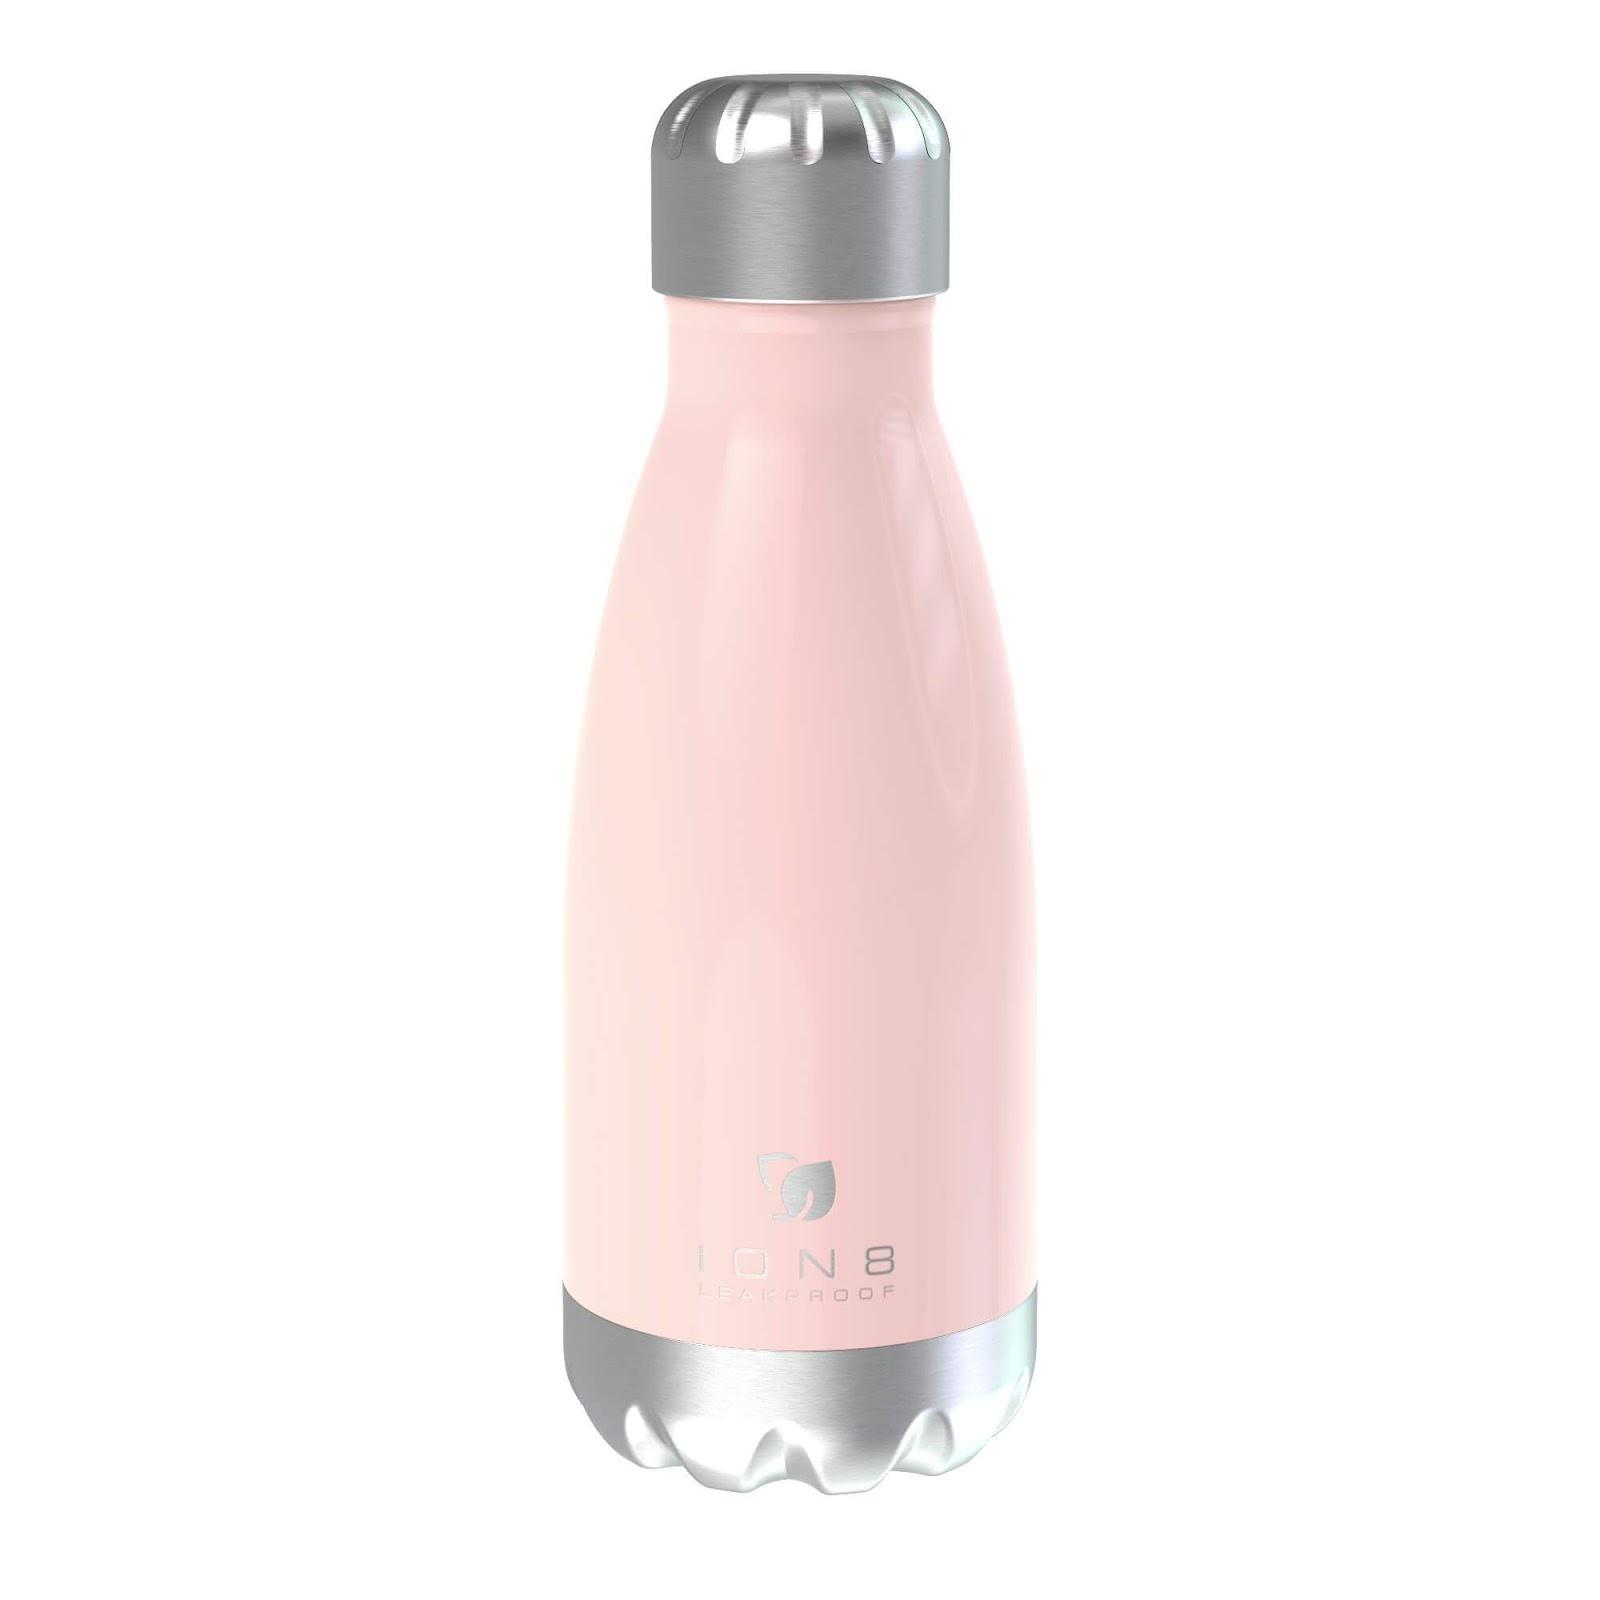 Ion8 Leak Proof Flask in Rose Quartz Pink